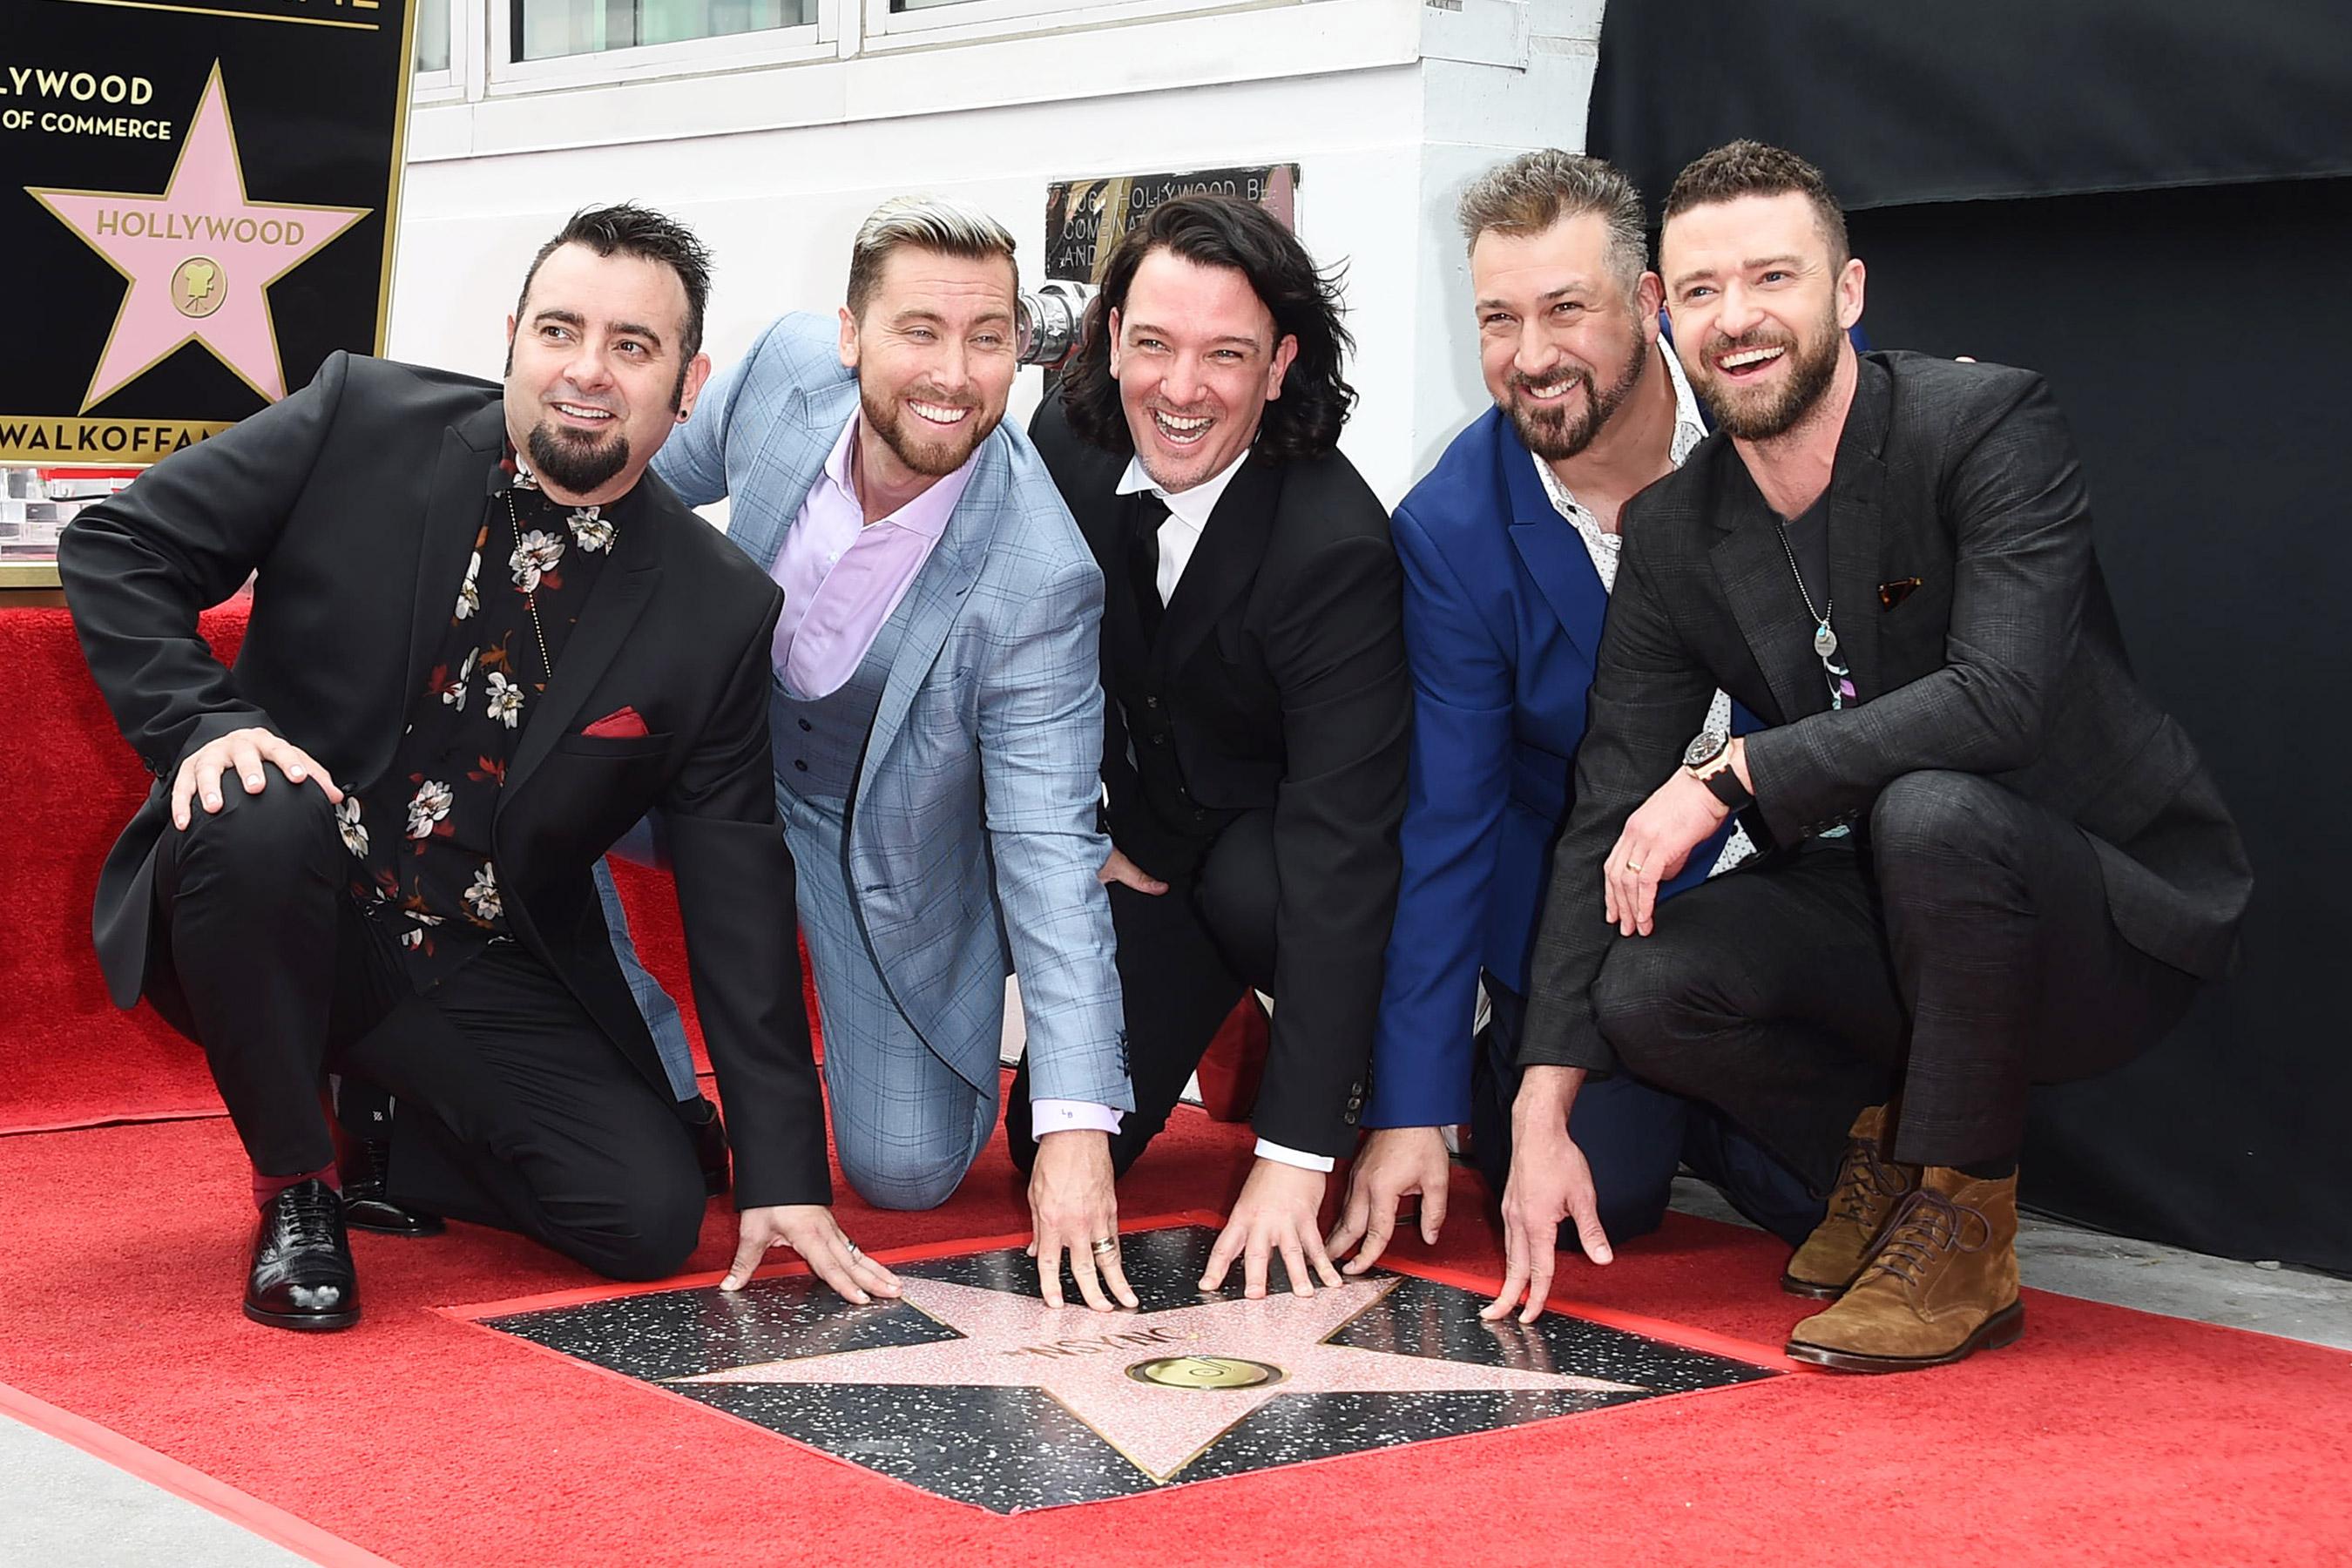 NSYNC Gets Star on Hollywood Walk of Fame